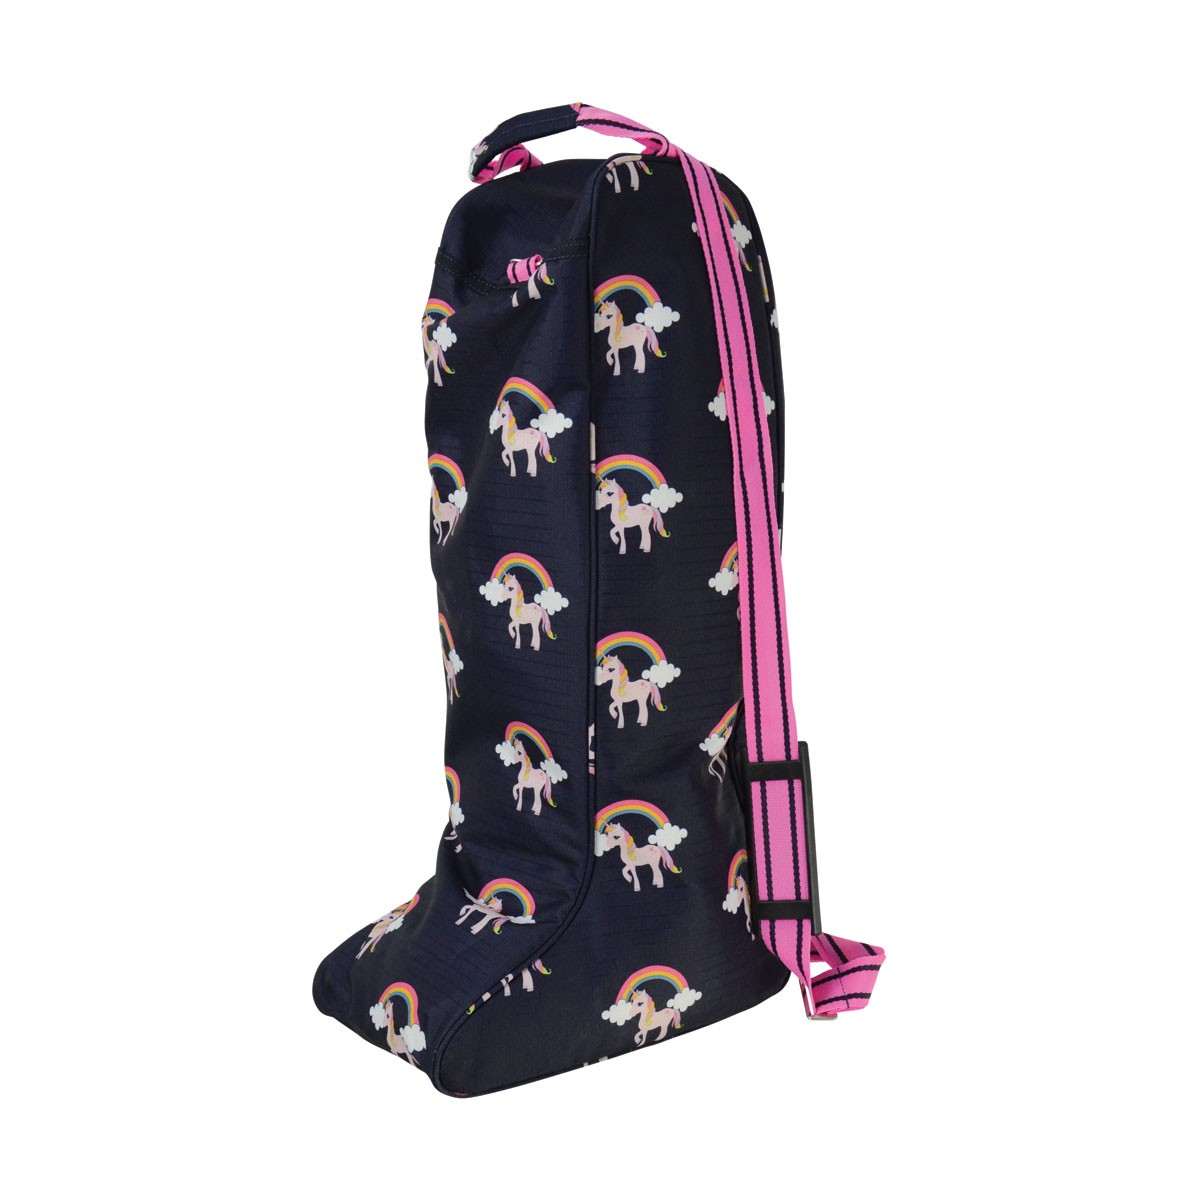 Hy Unicorn Long Boots Bag